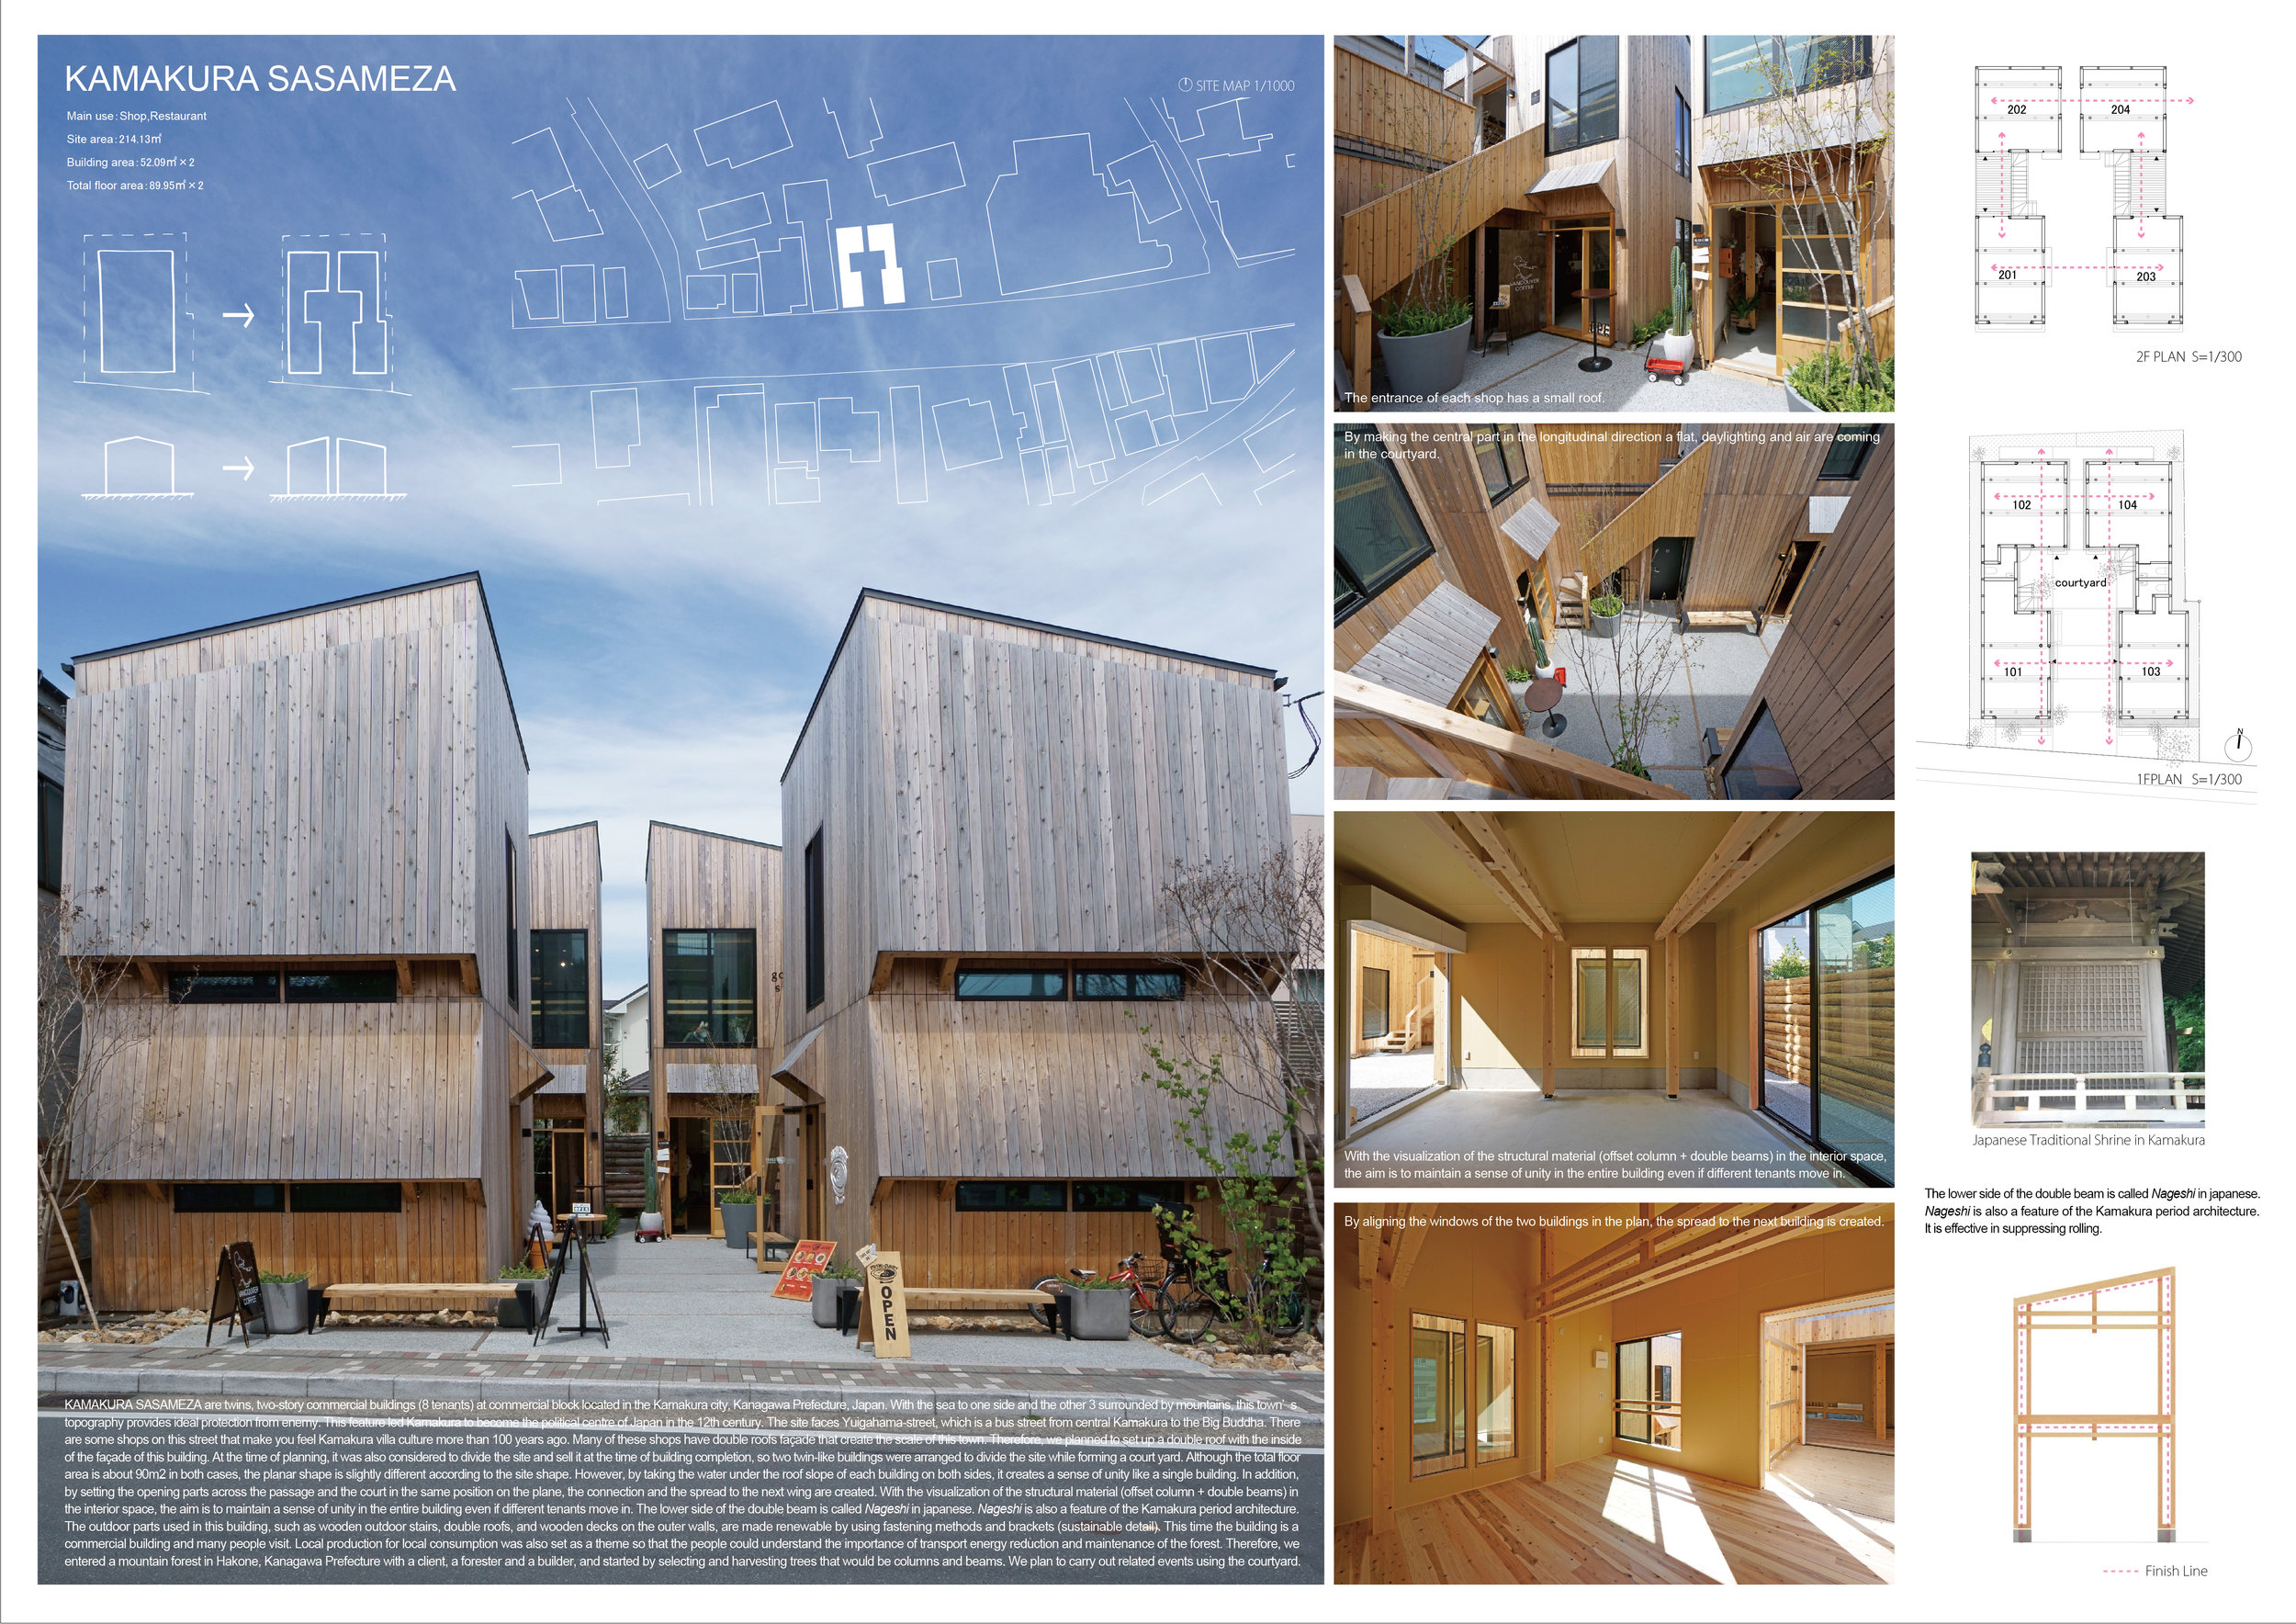 Project Name: Kamakura Sasameza - Design by: Yuji Tanabe ArchitectsArchitecture Division: CommercialWebsite: www.yuji-tanabe.com